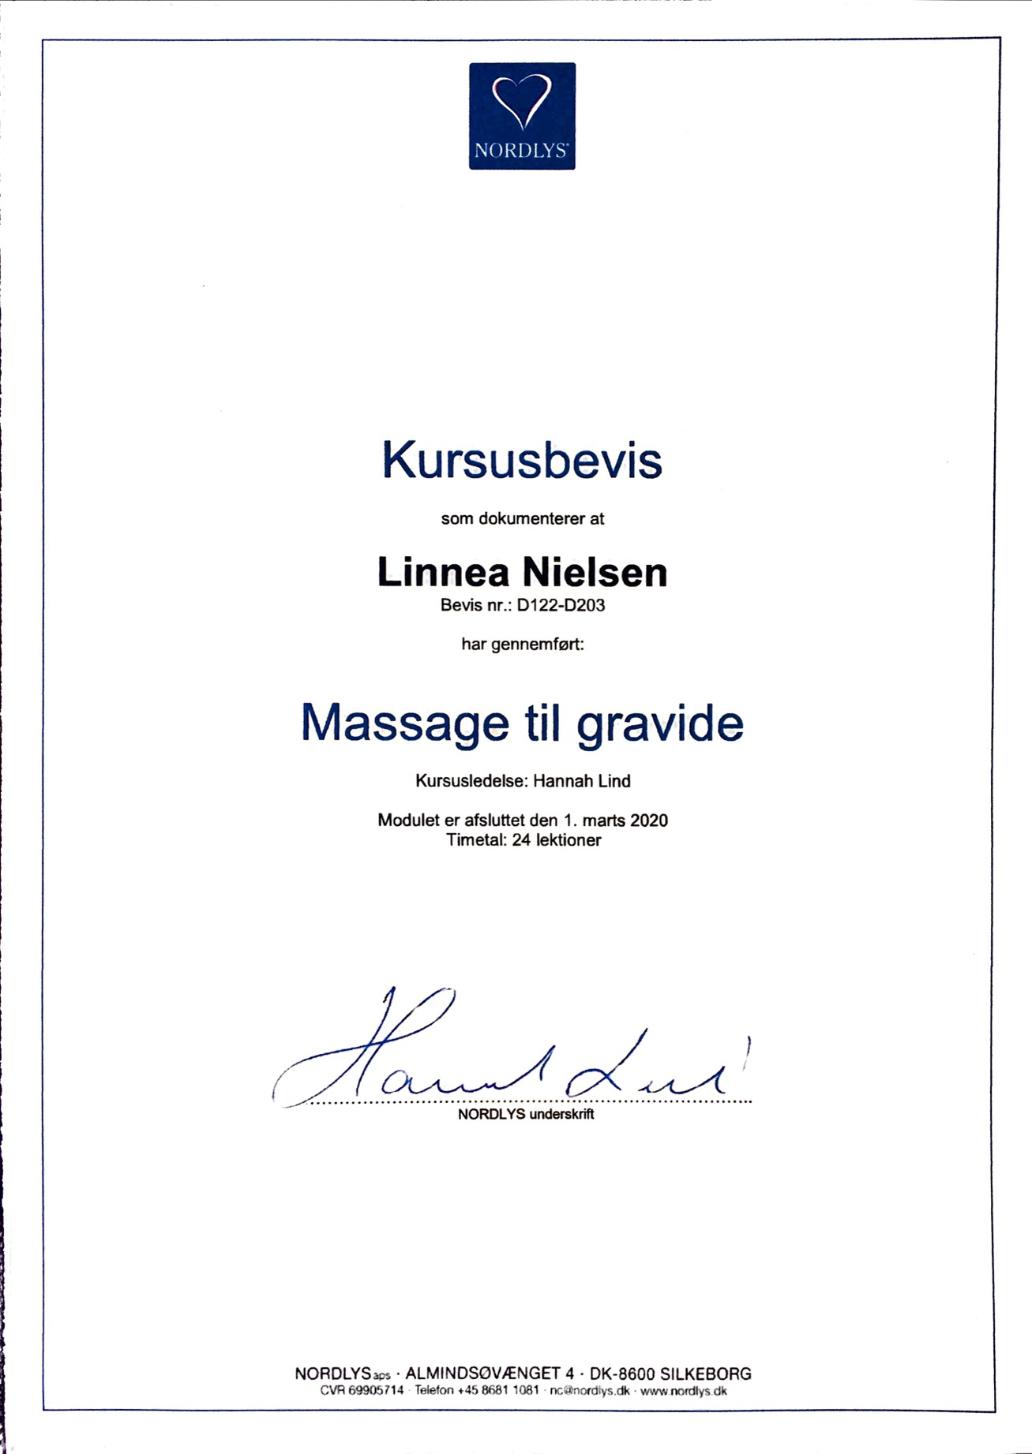 Gravidmassage certifikat